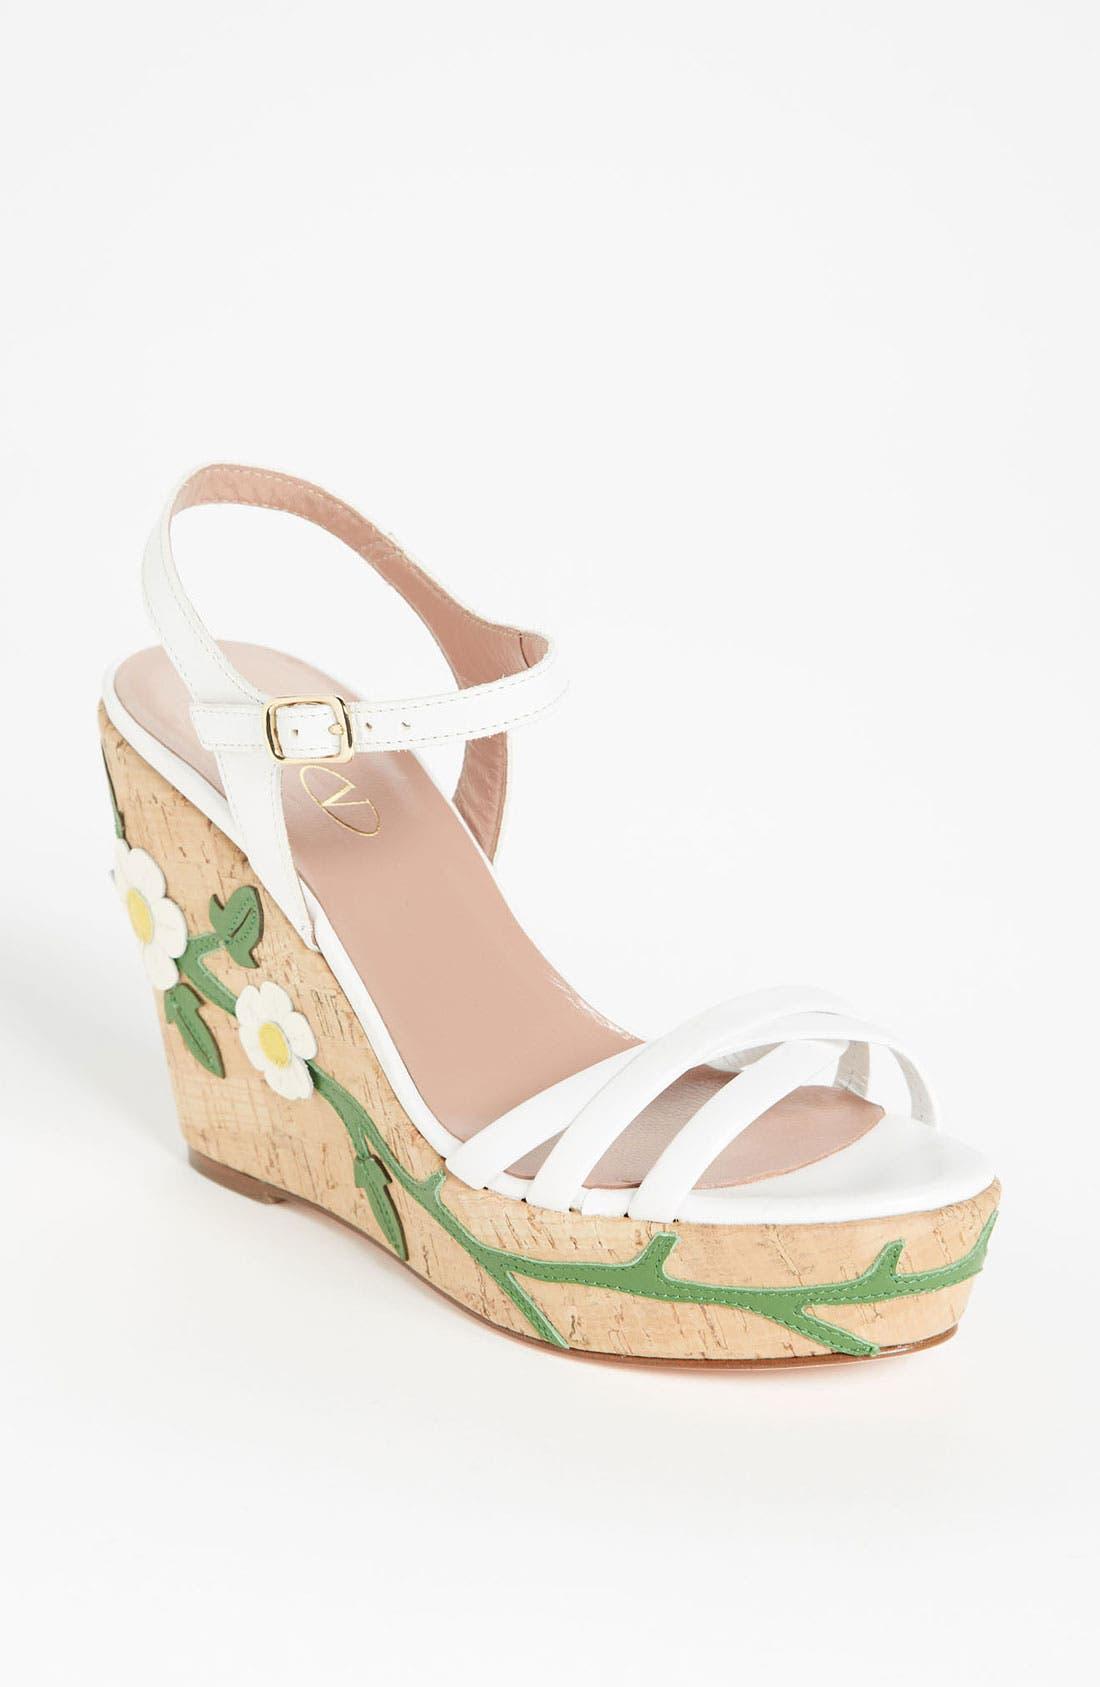 Main Image - RED Valentino 'Daisy' Wedge Sandal